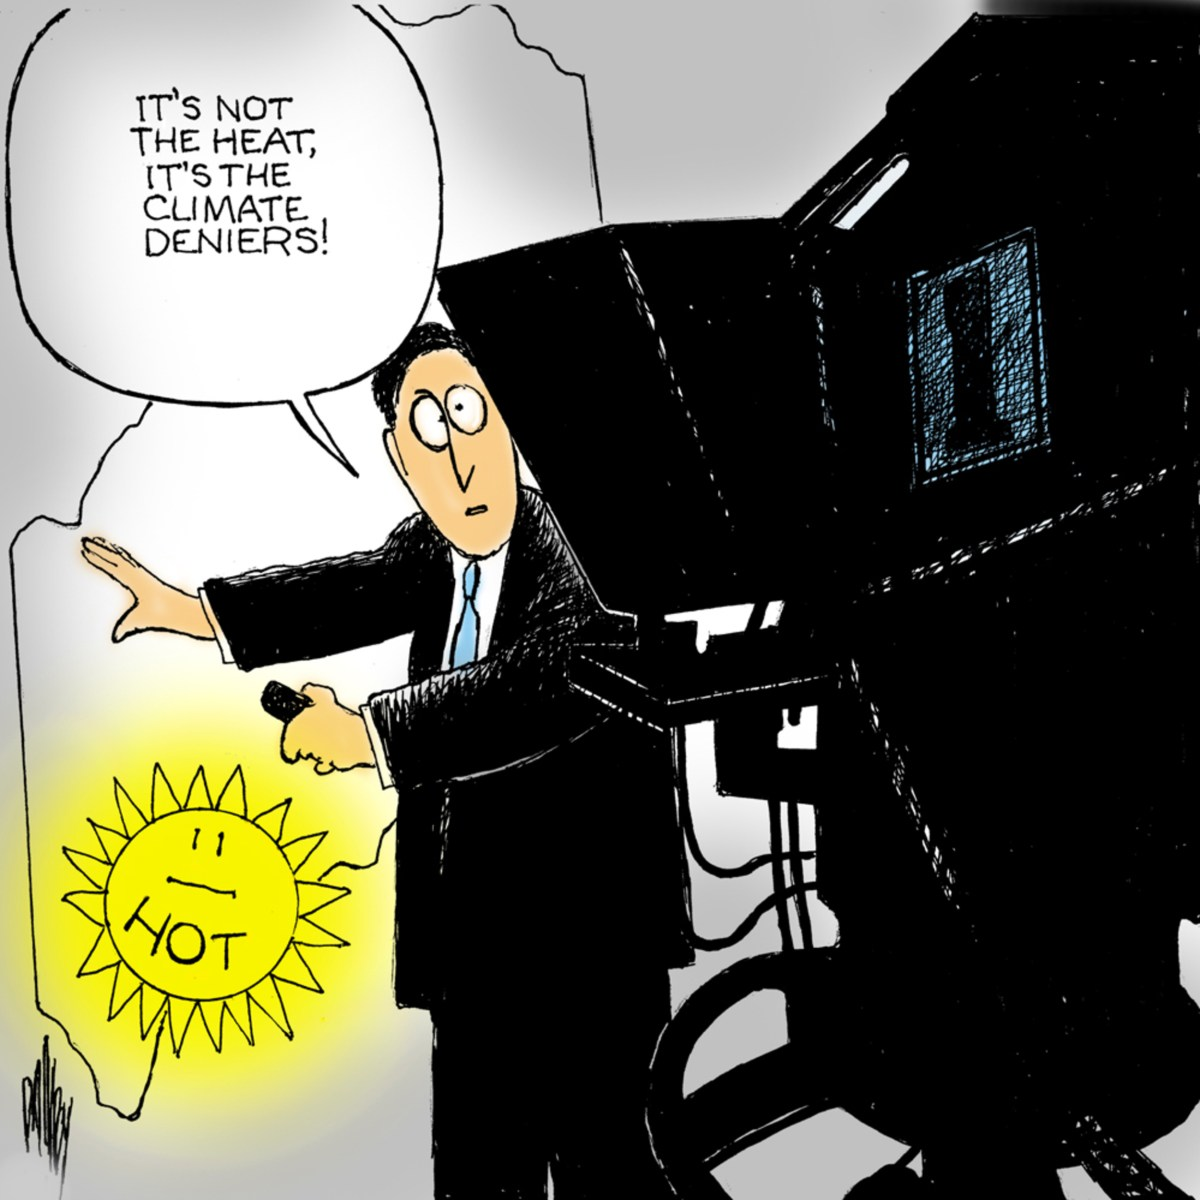 Weather man forecasting